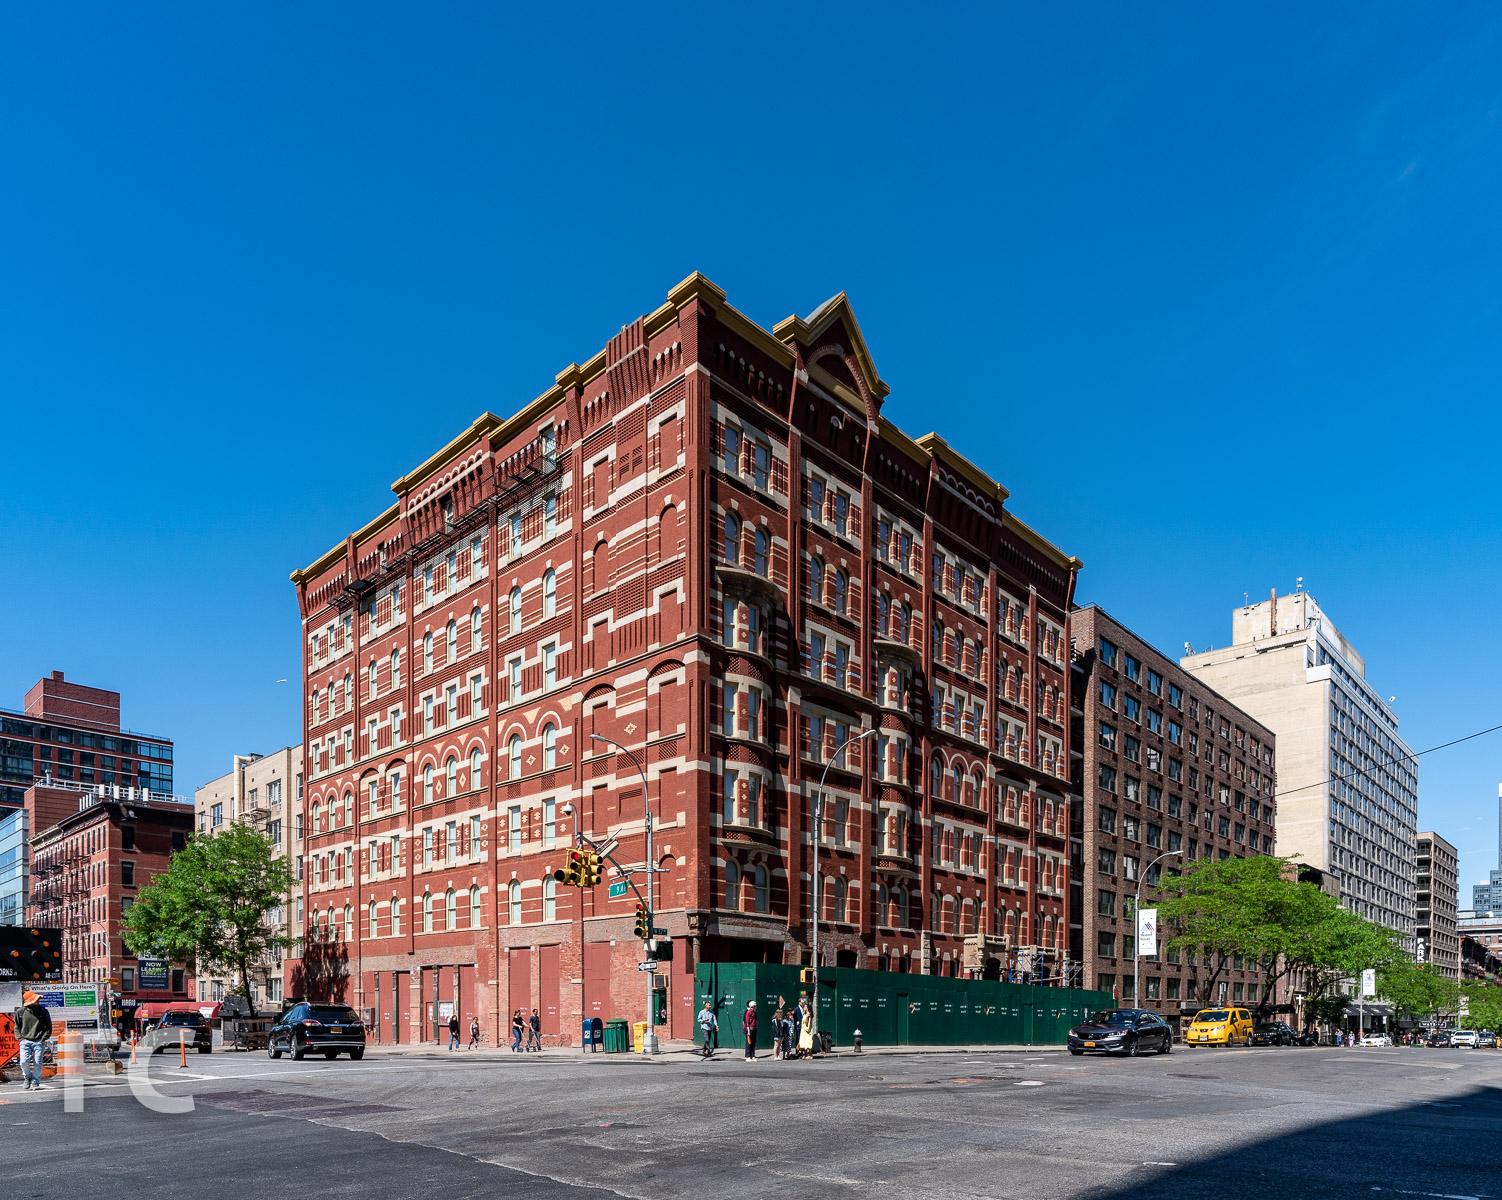 Northeast corner from West 57th Street.